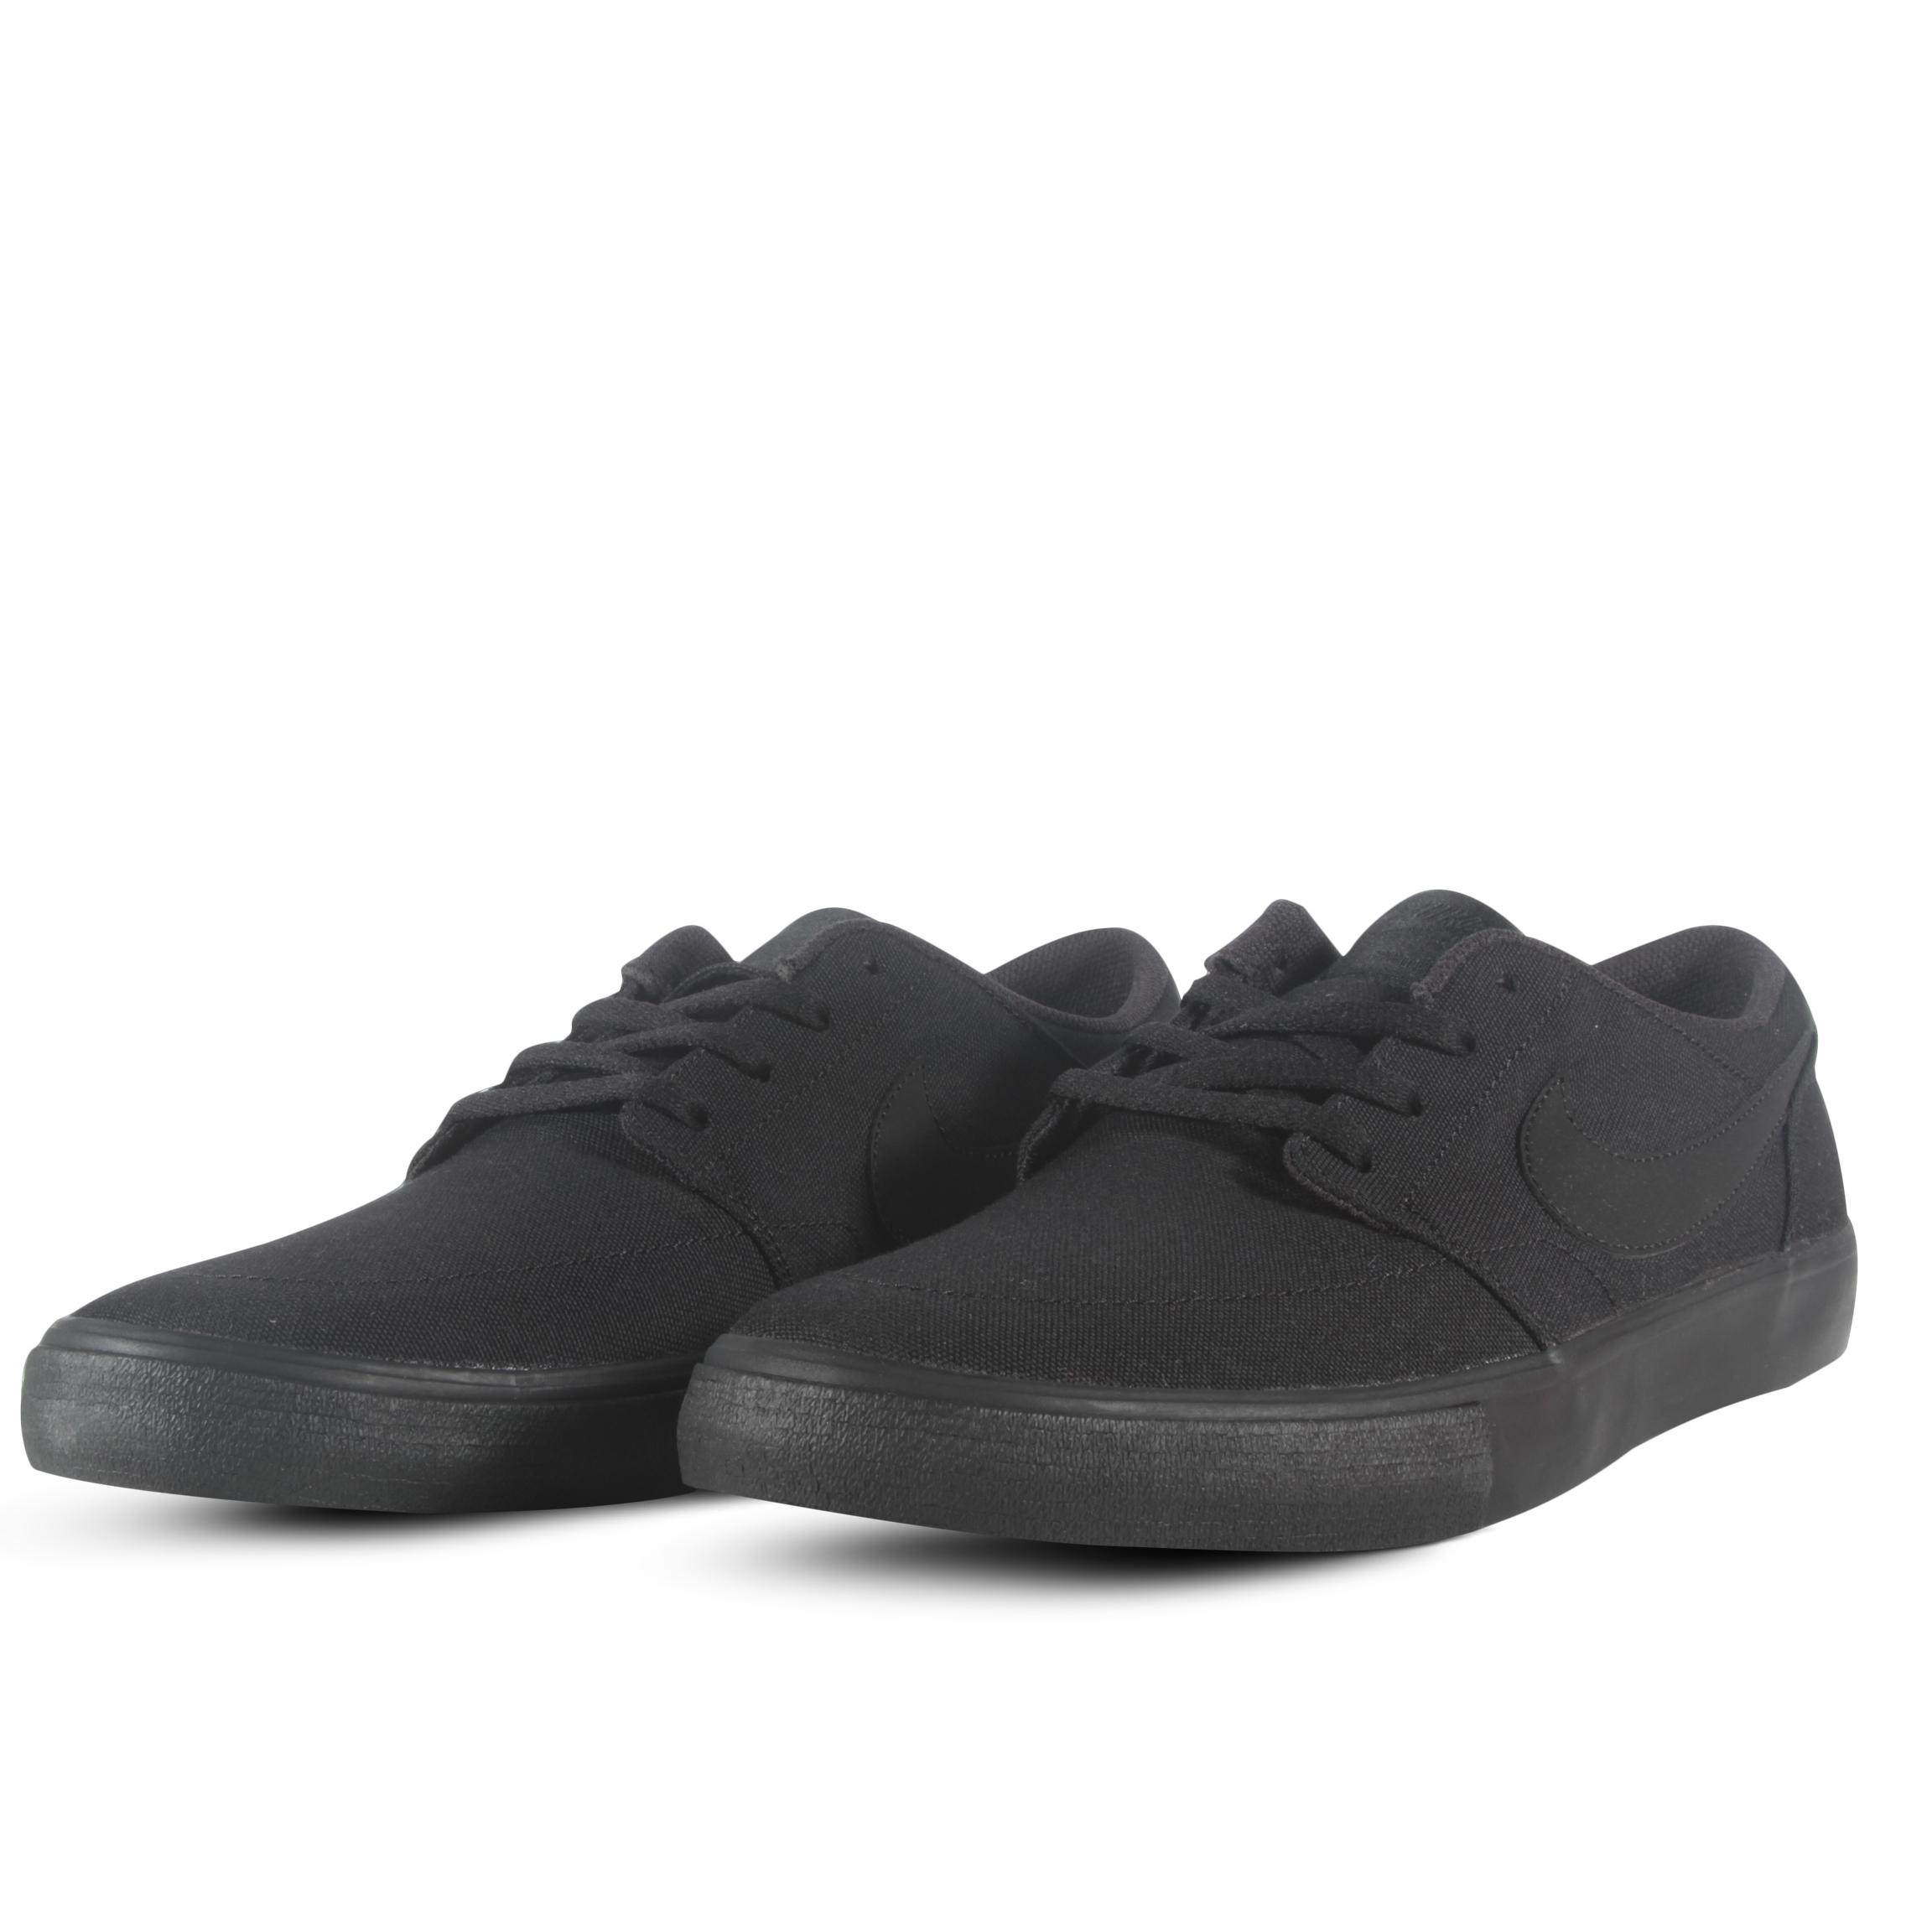 6de8ee84ce80 ... Men s Nike SB Portmore II Solar Solar Solar Canvas Skateboarding Shoes  880268-001 af3802 ...